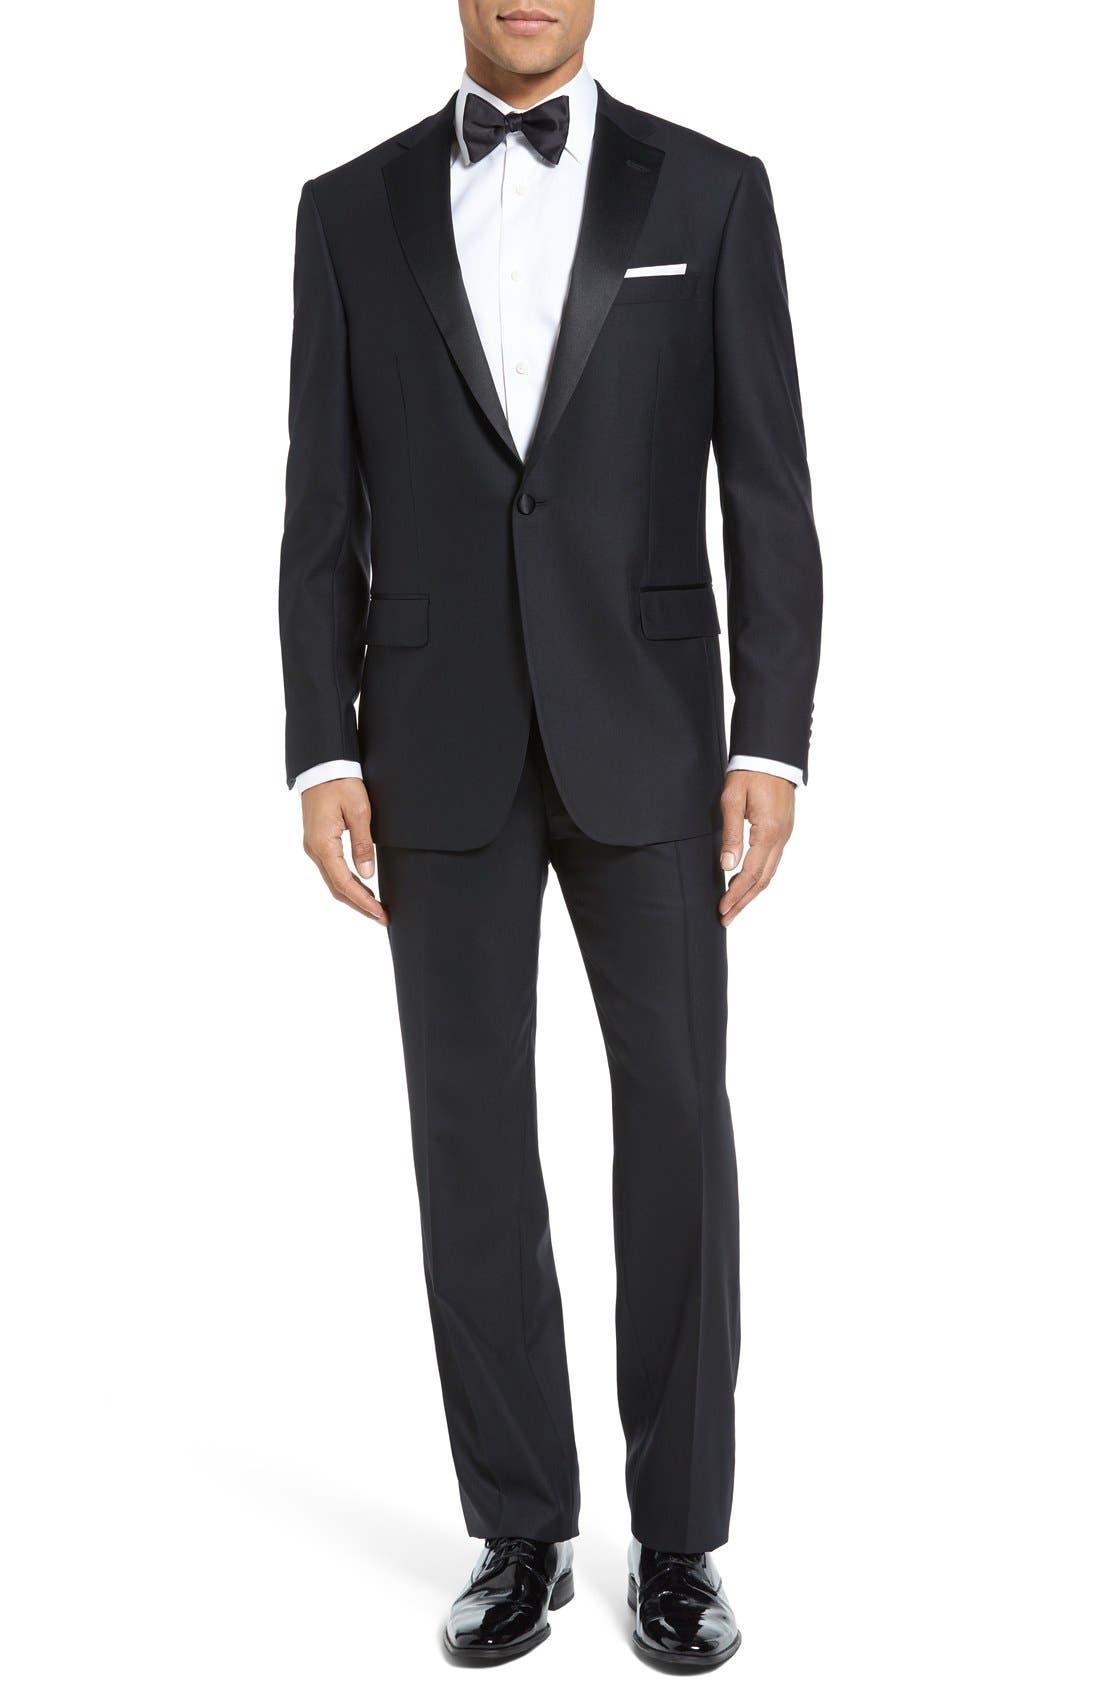 HART SCHAFFNER MARX, New York Classic Fit Black Wool Tuxedo, Main thumbnail 1, color, BLACK